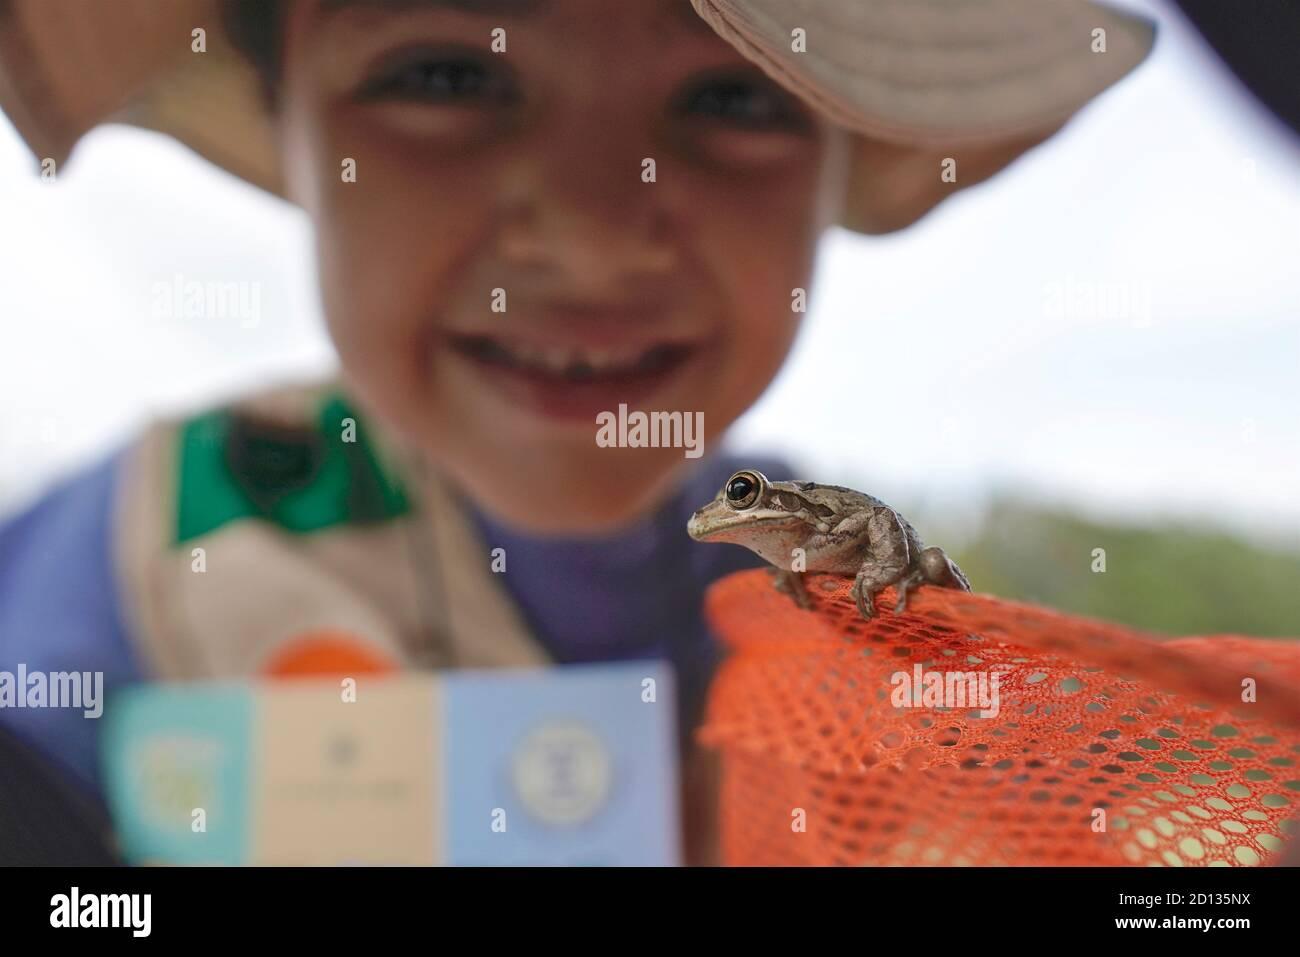 Chica mirando de cerca a una rana Foto de stock